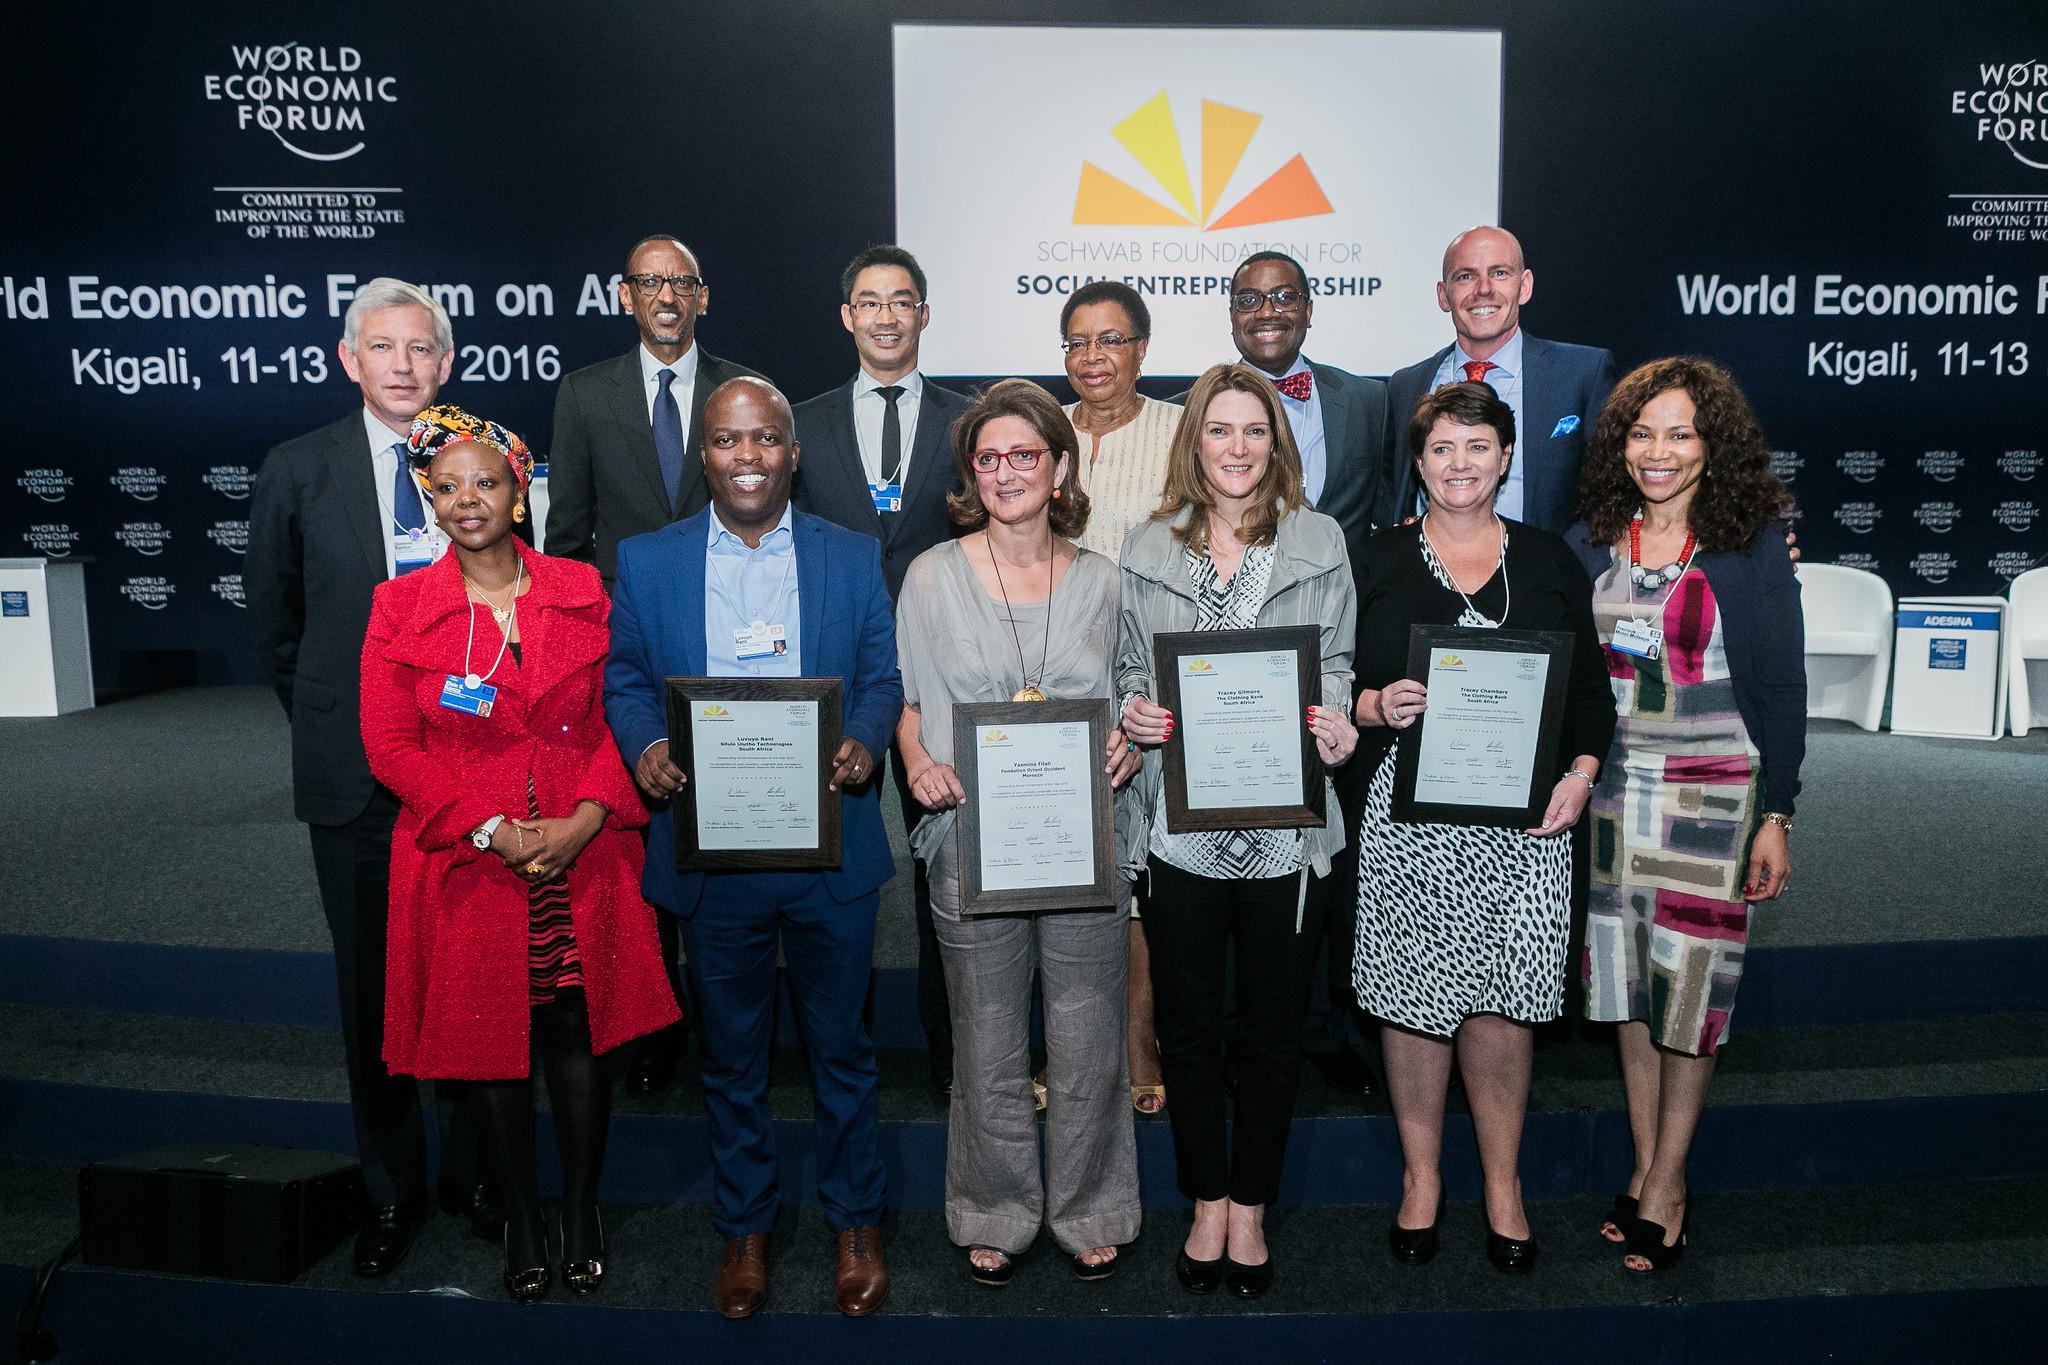 Awardees at the World Economic Forum on Africa 2016 in Kigali, Rwanda